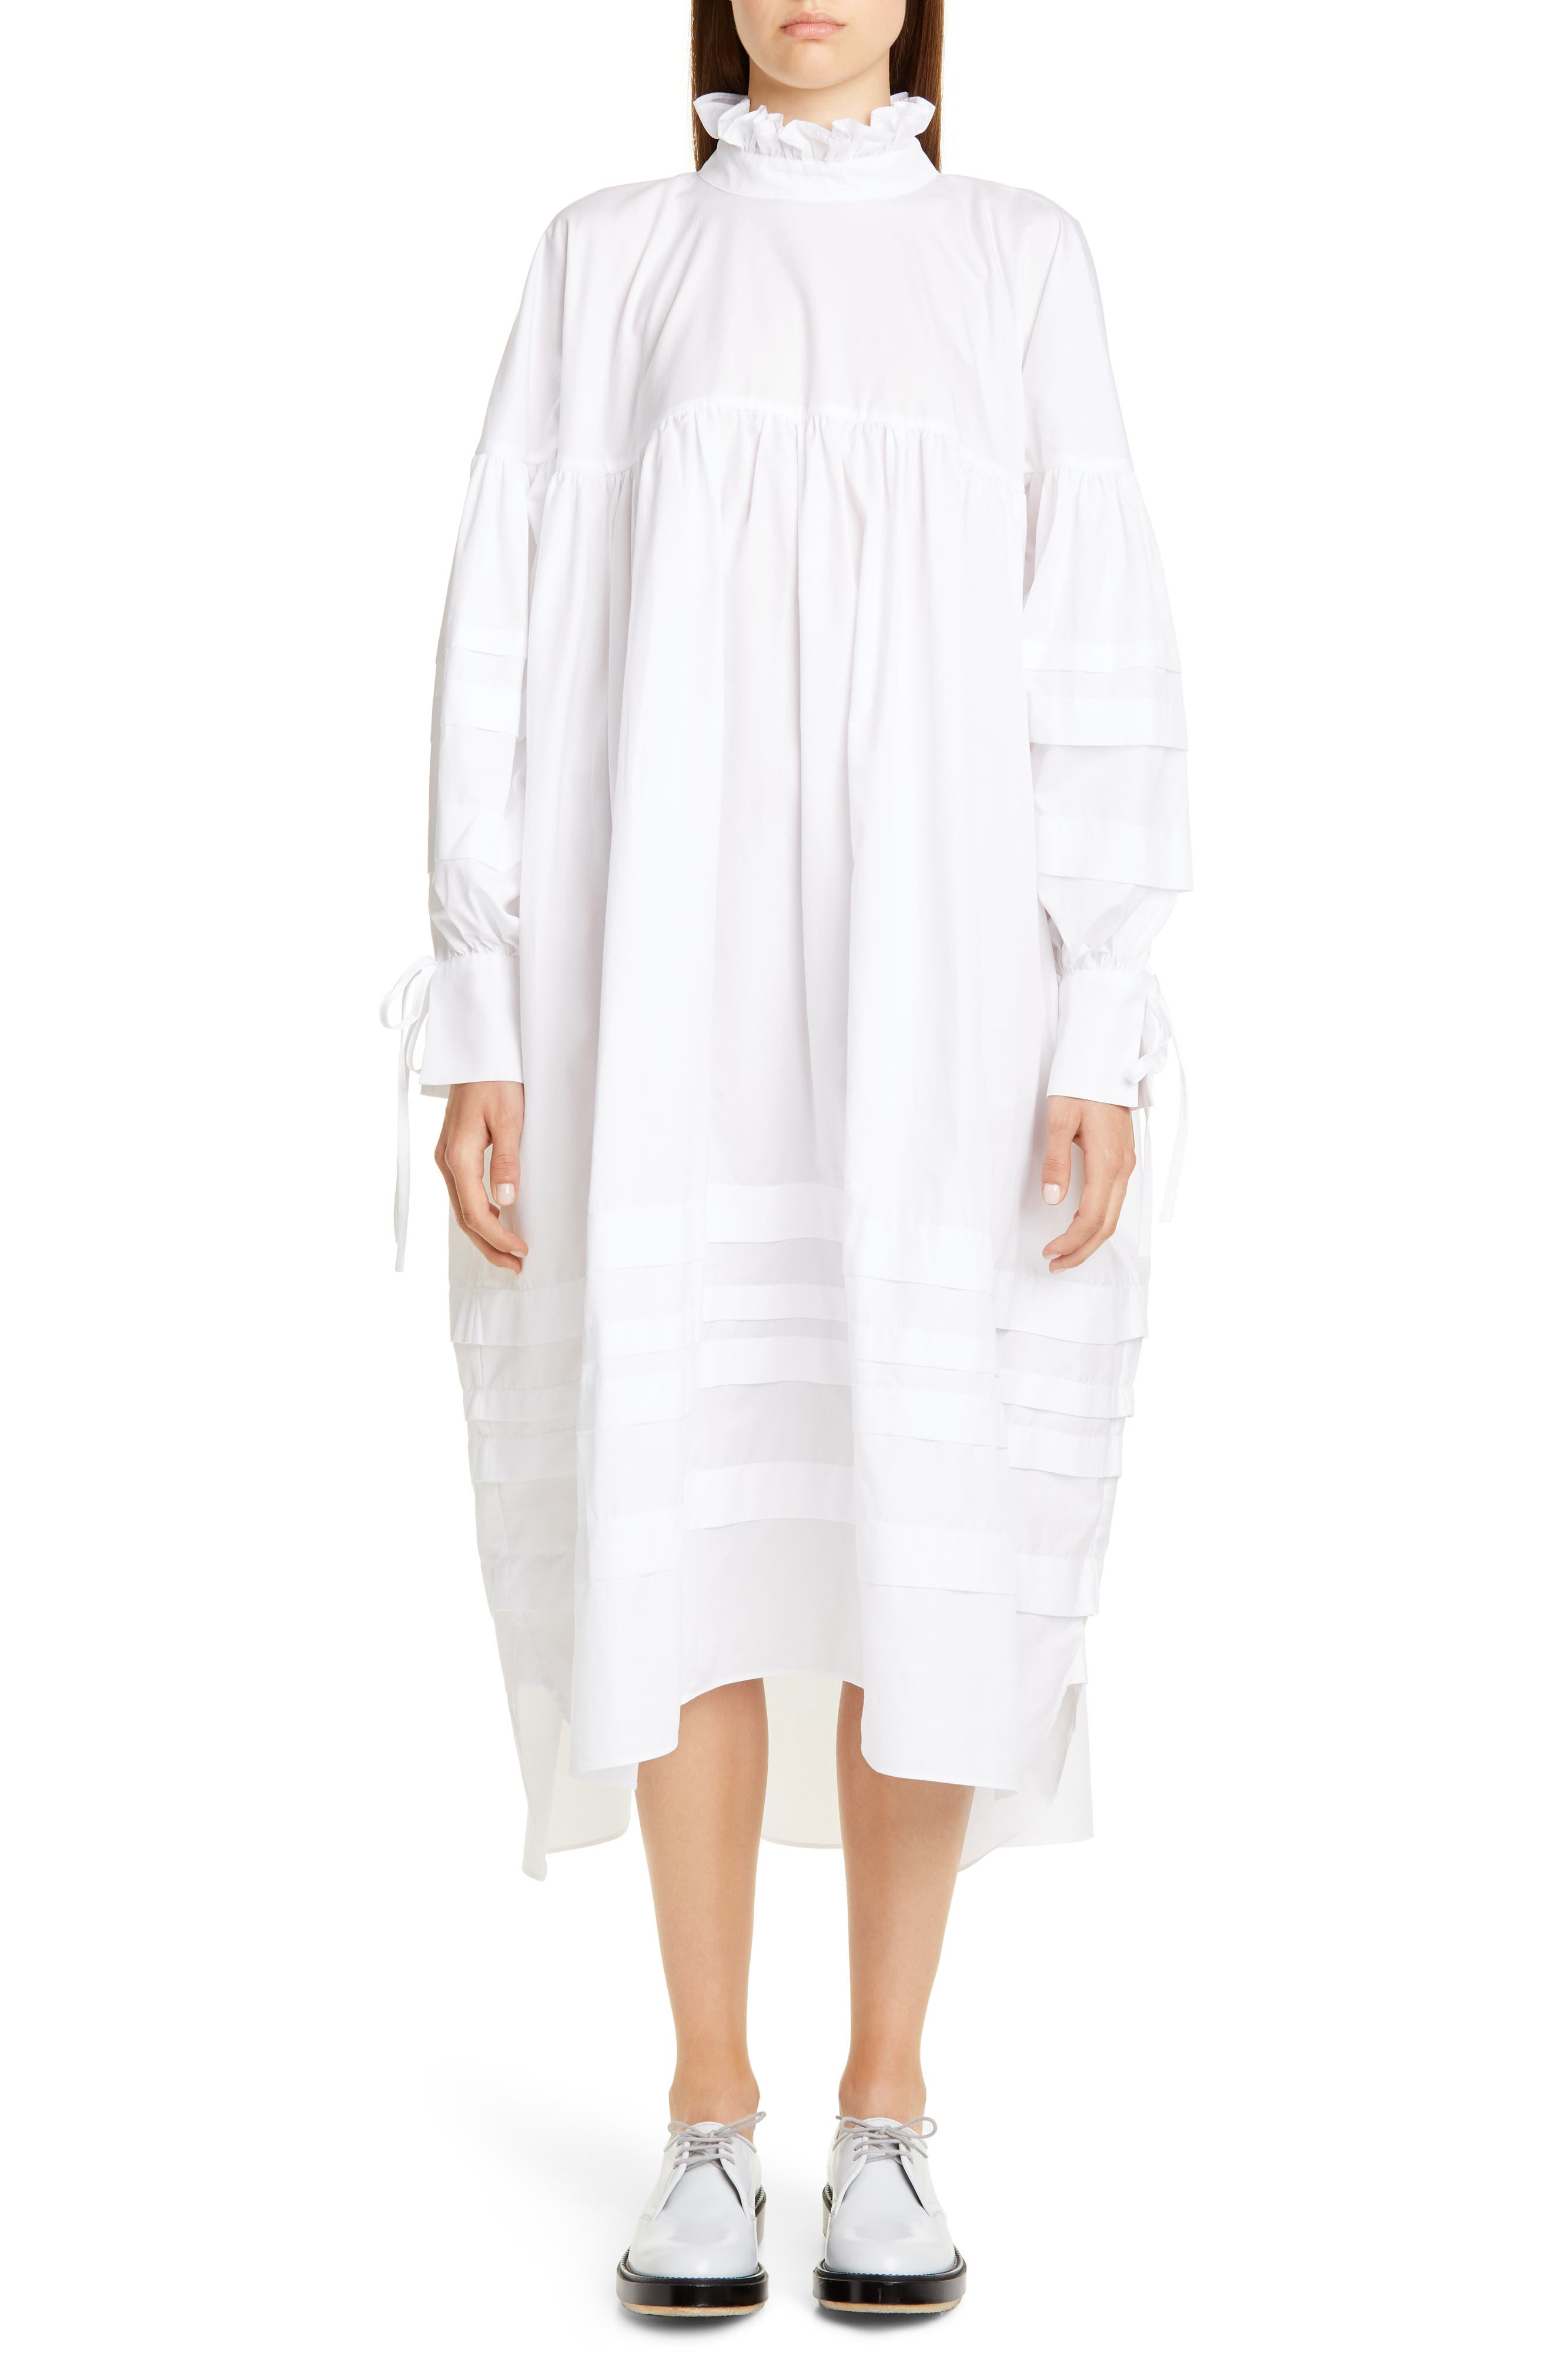 Cecilie Bahnsen Beate Pleated Long Sleeve Midi Dress, US / 6 UK - White